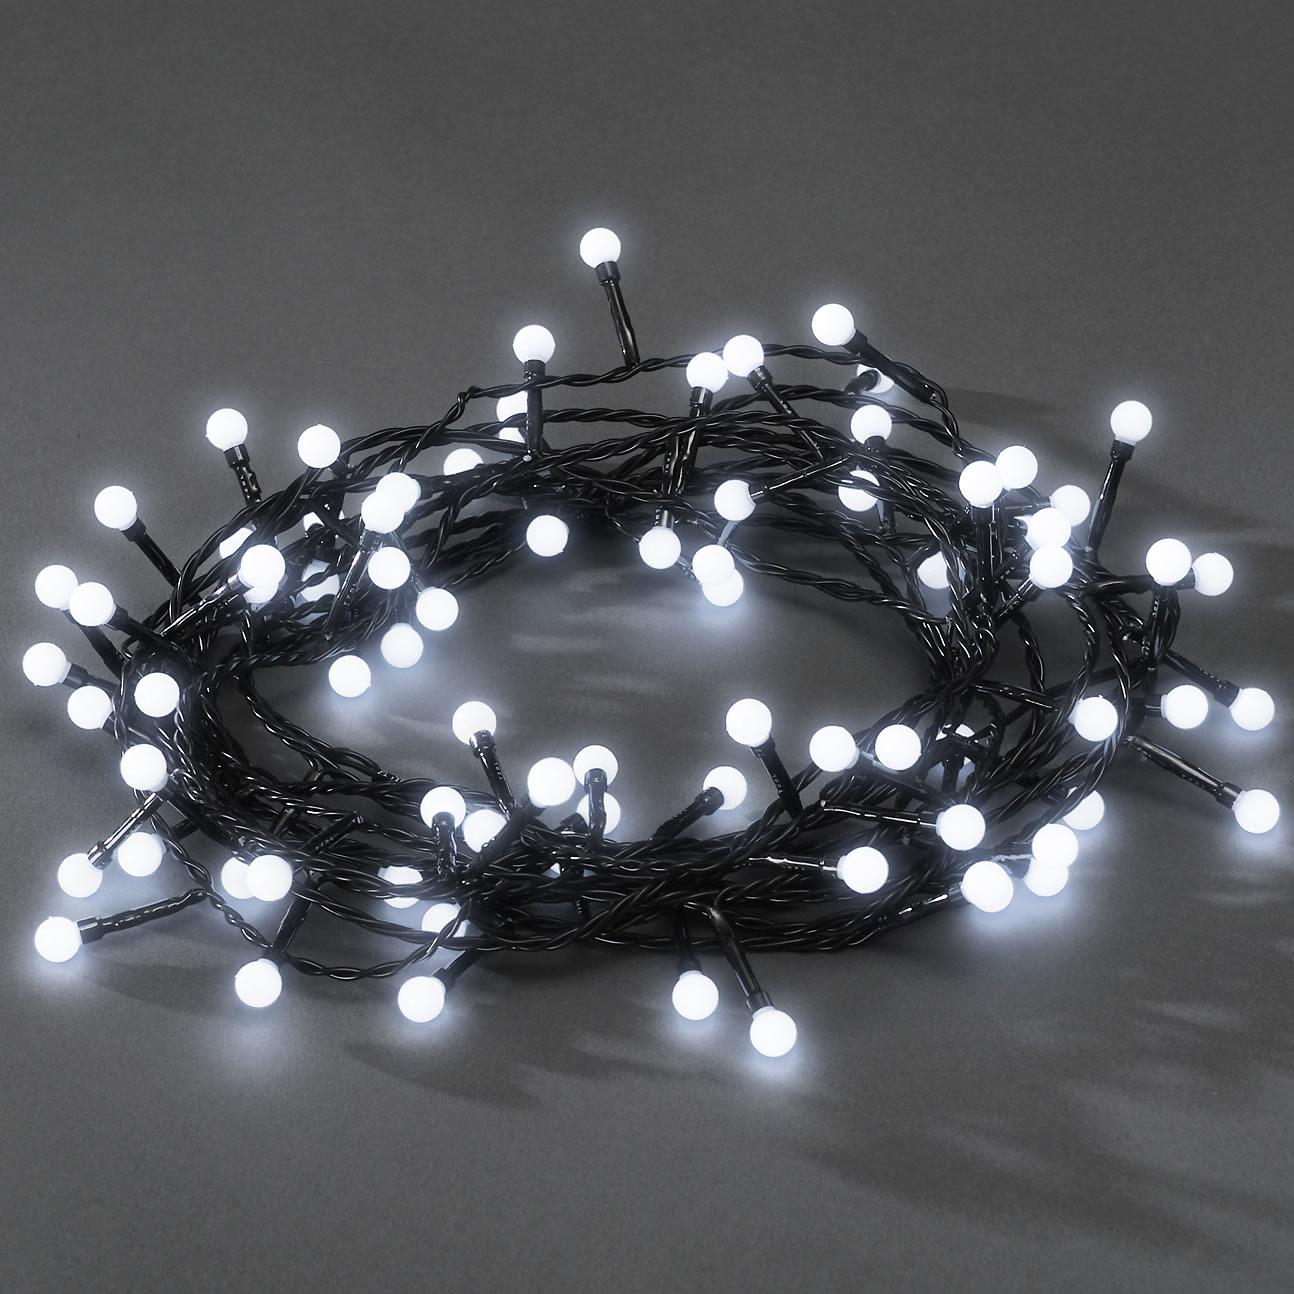 Gnosjö Konstsmide GmbH Konstsmide LED-Lichterkette, weiß, 6,3m, 80 runde LEDs 3691-207